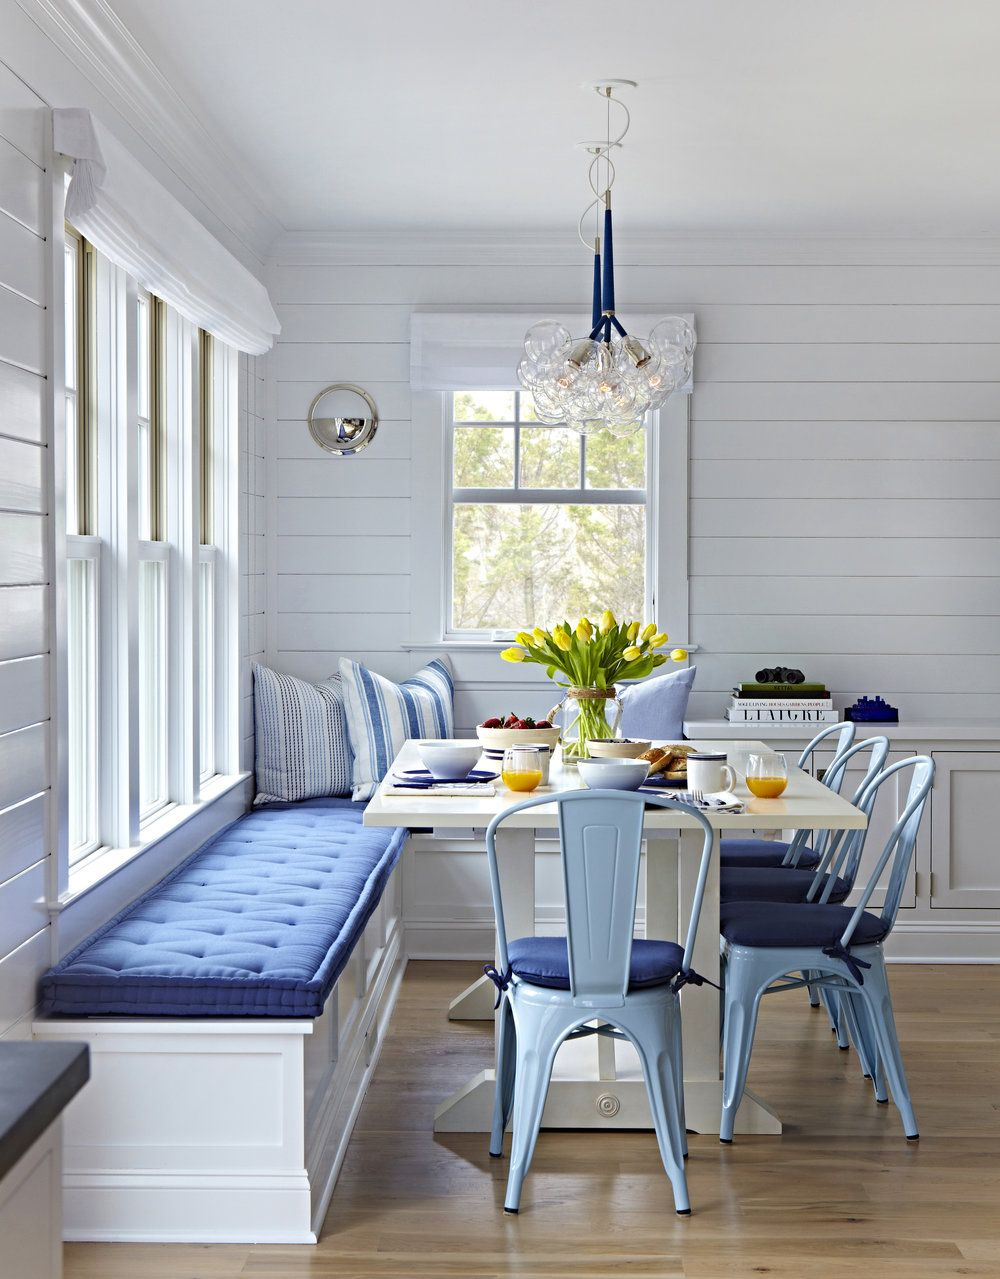 Modern Victorian Kitchen Breakfast Nook Interiordesign Homedecor In 2020 With Images Dining Room Small Dining Room Bench Seating Breakfast Nook Cushions